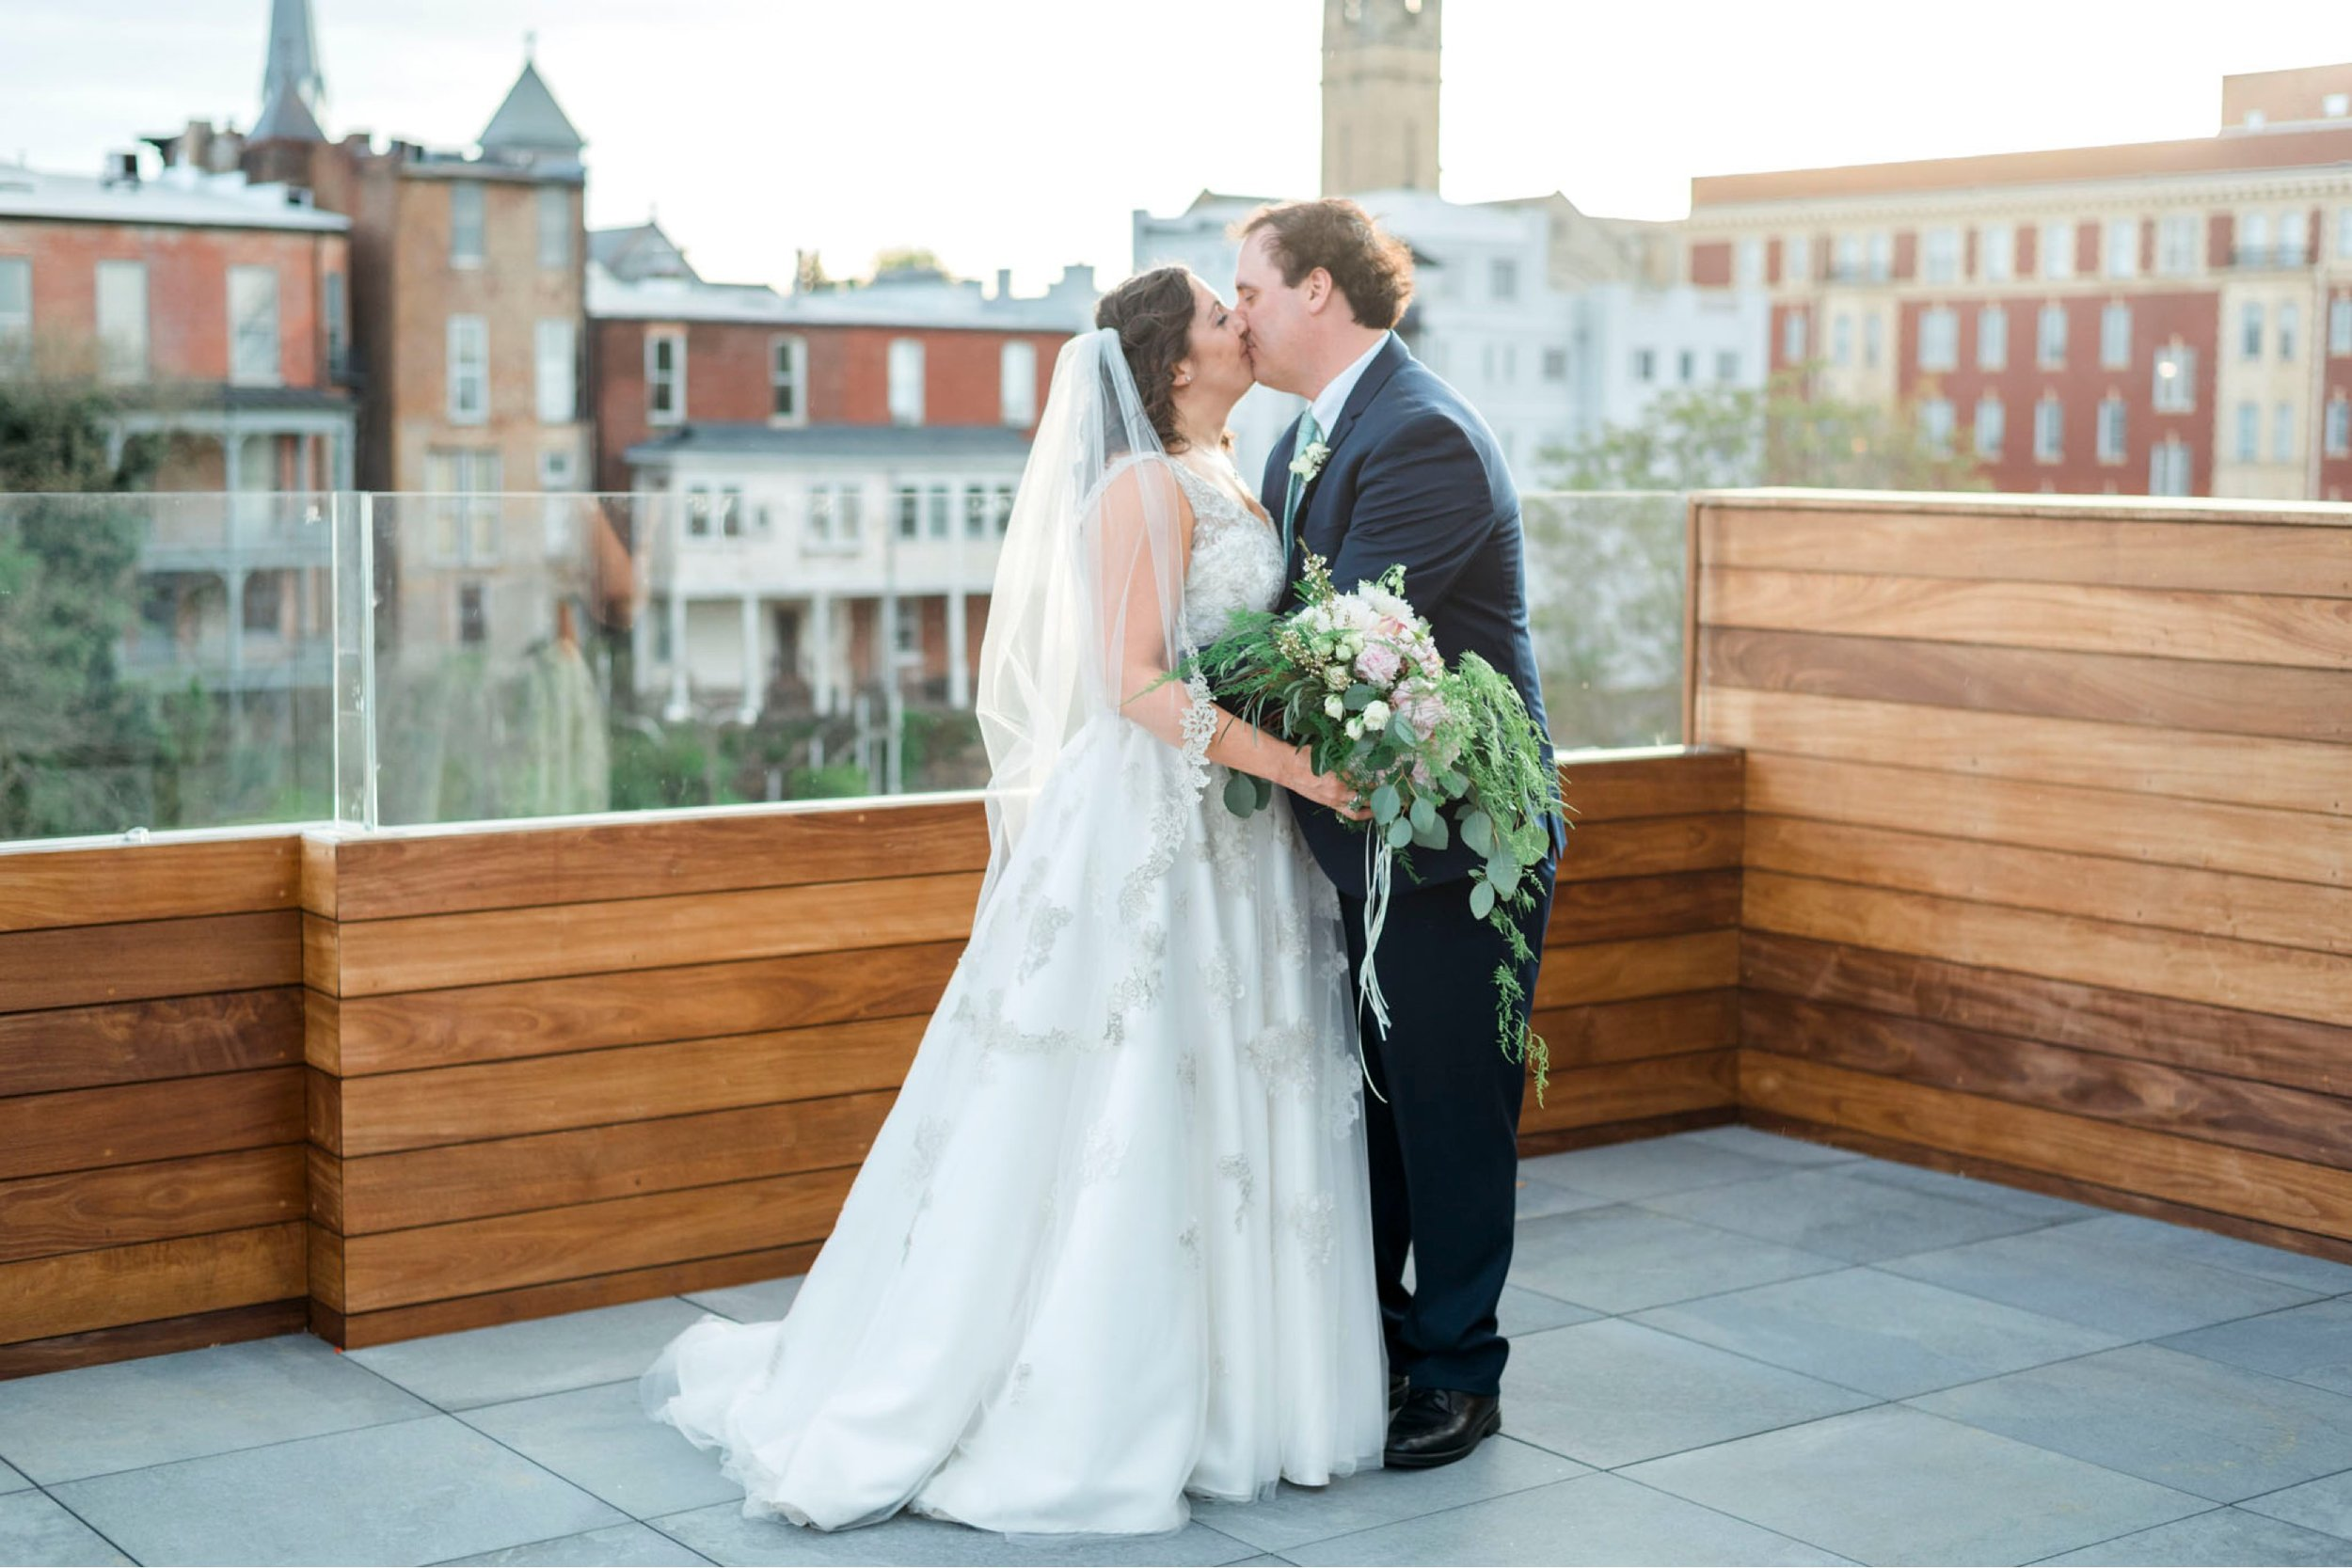 TheVirginianHotel_LynchburgVA_TheVirginianHotelWedding_Virginiaweddingphotographer_Lynchburgvawedding 7.jpg